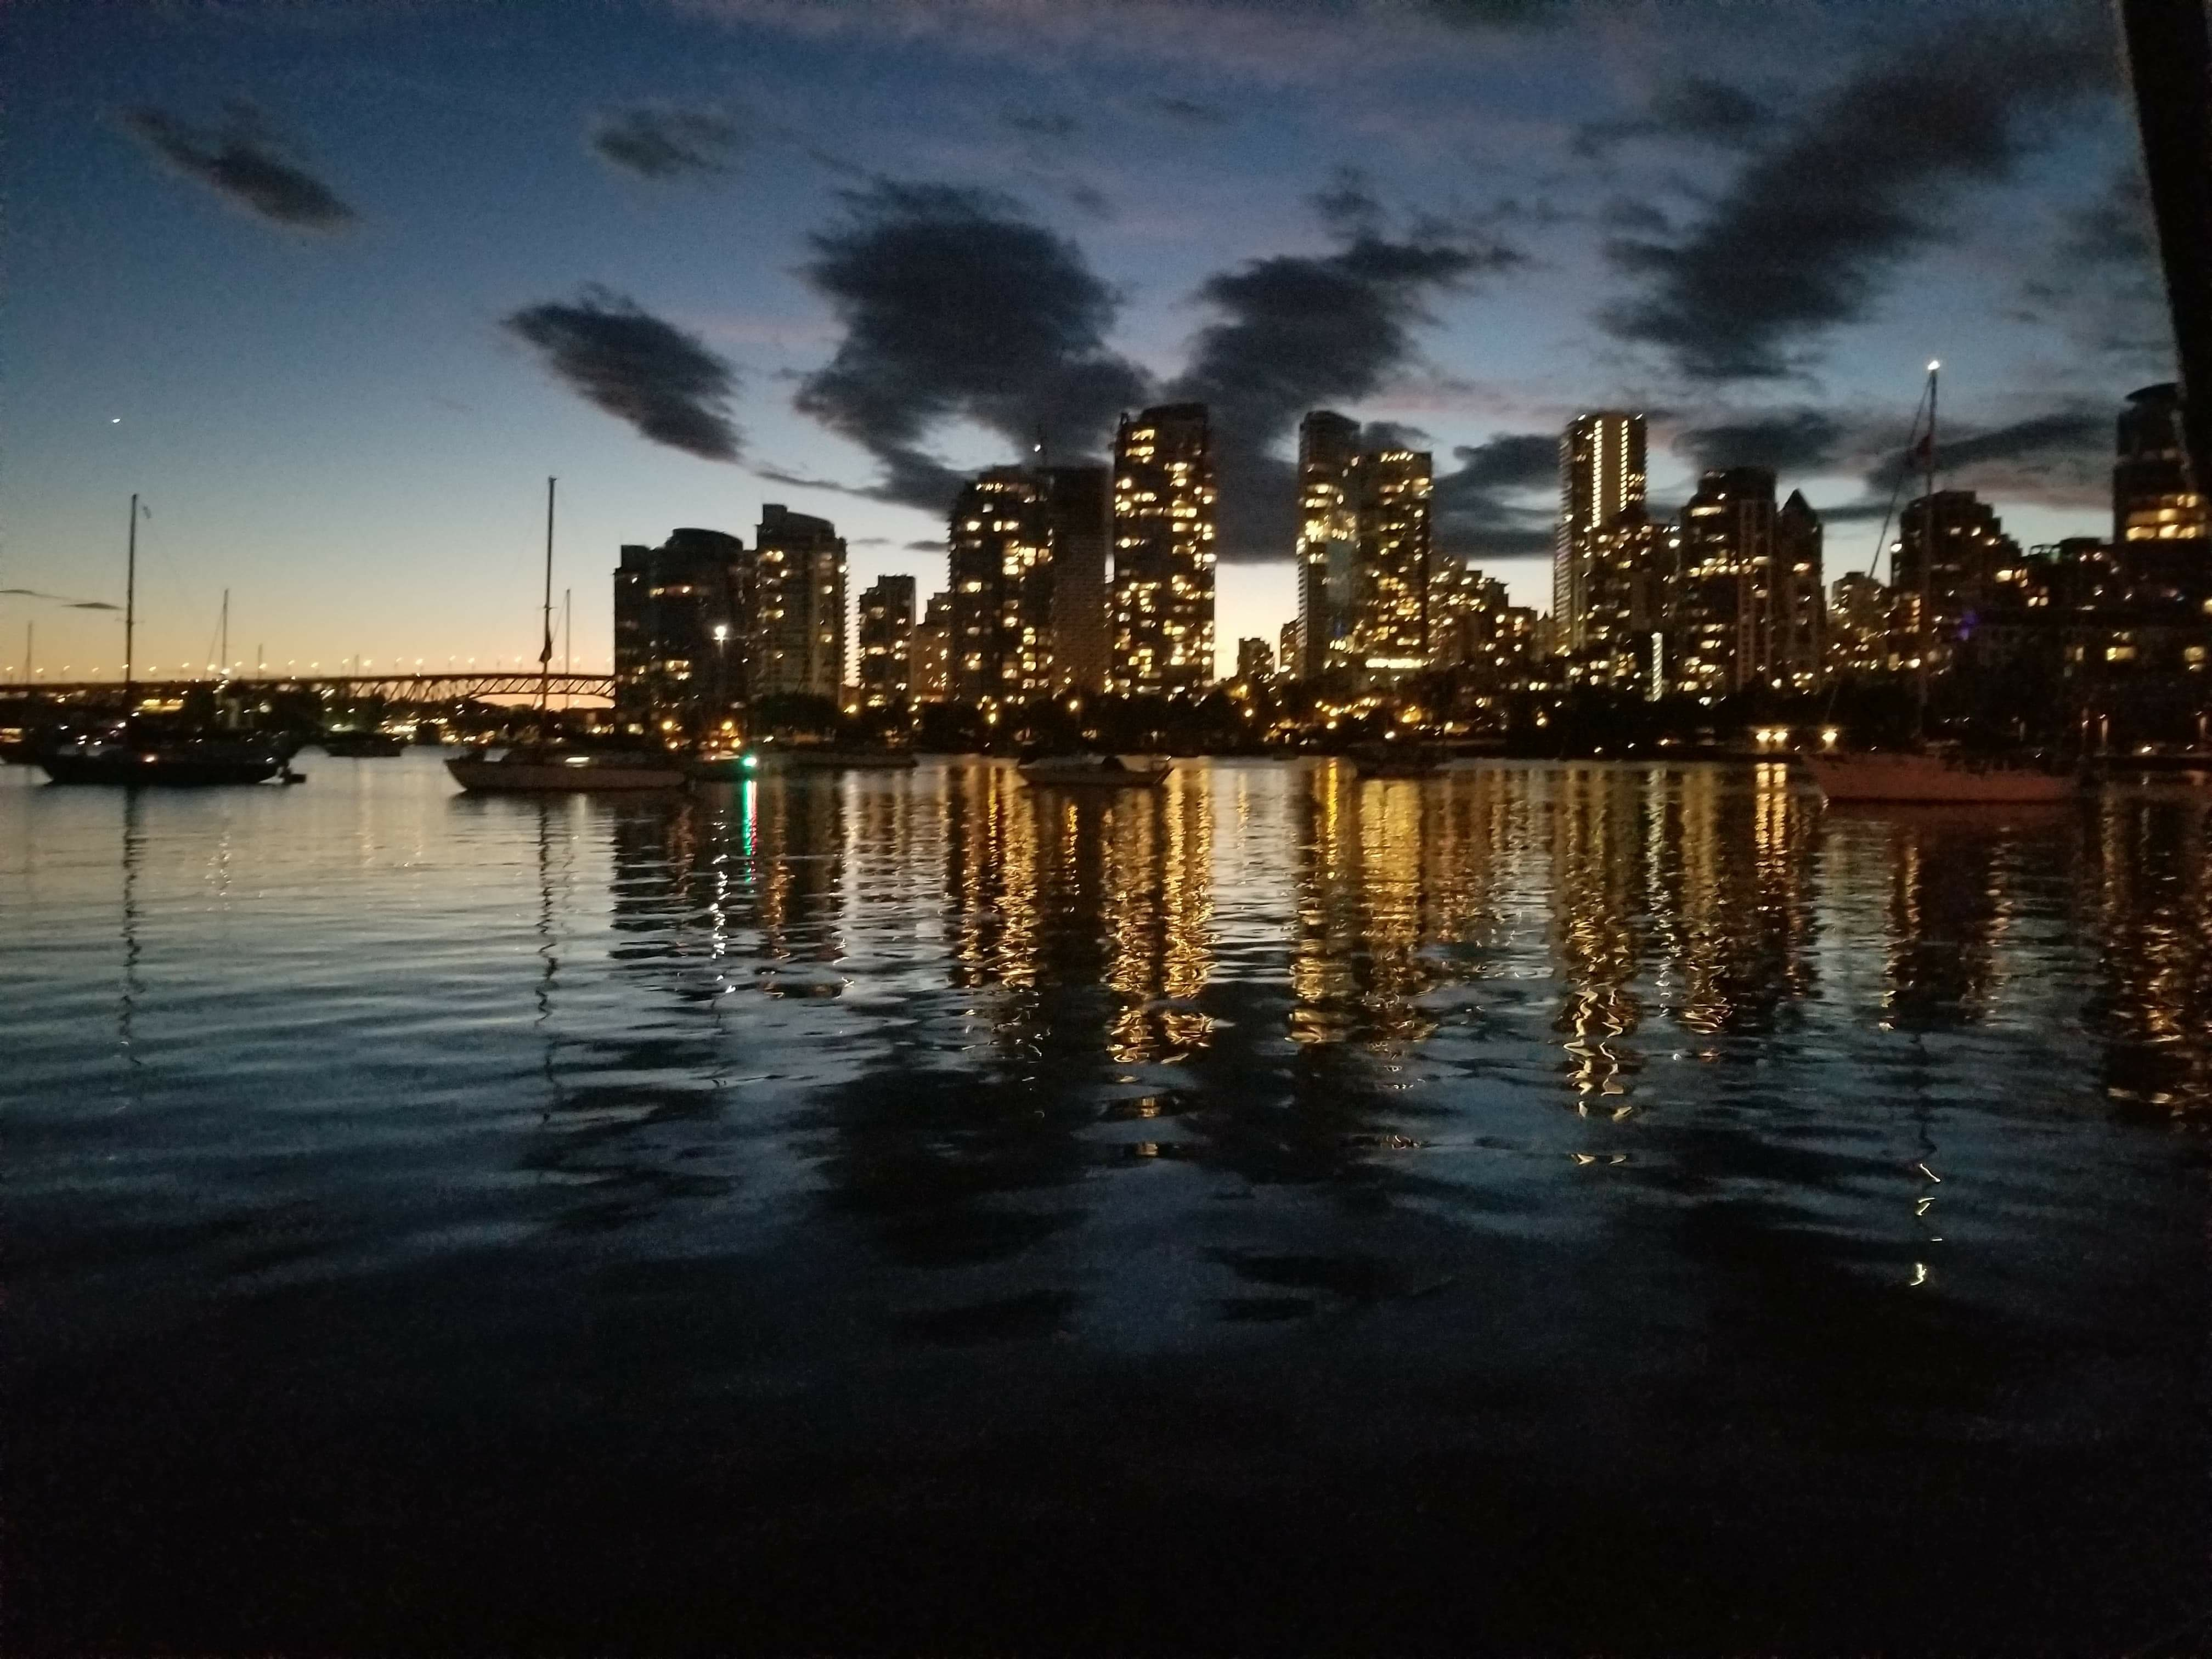 False Creek (Vancouver) after sunset